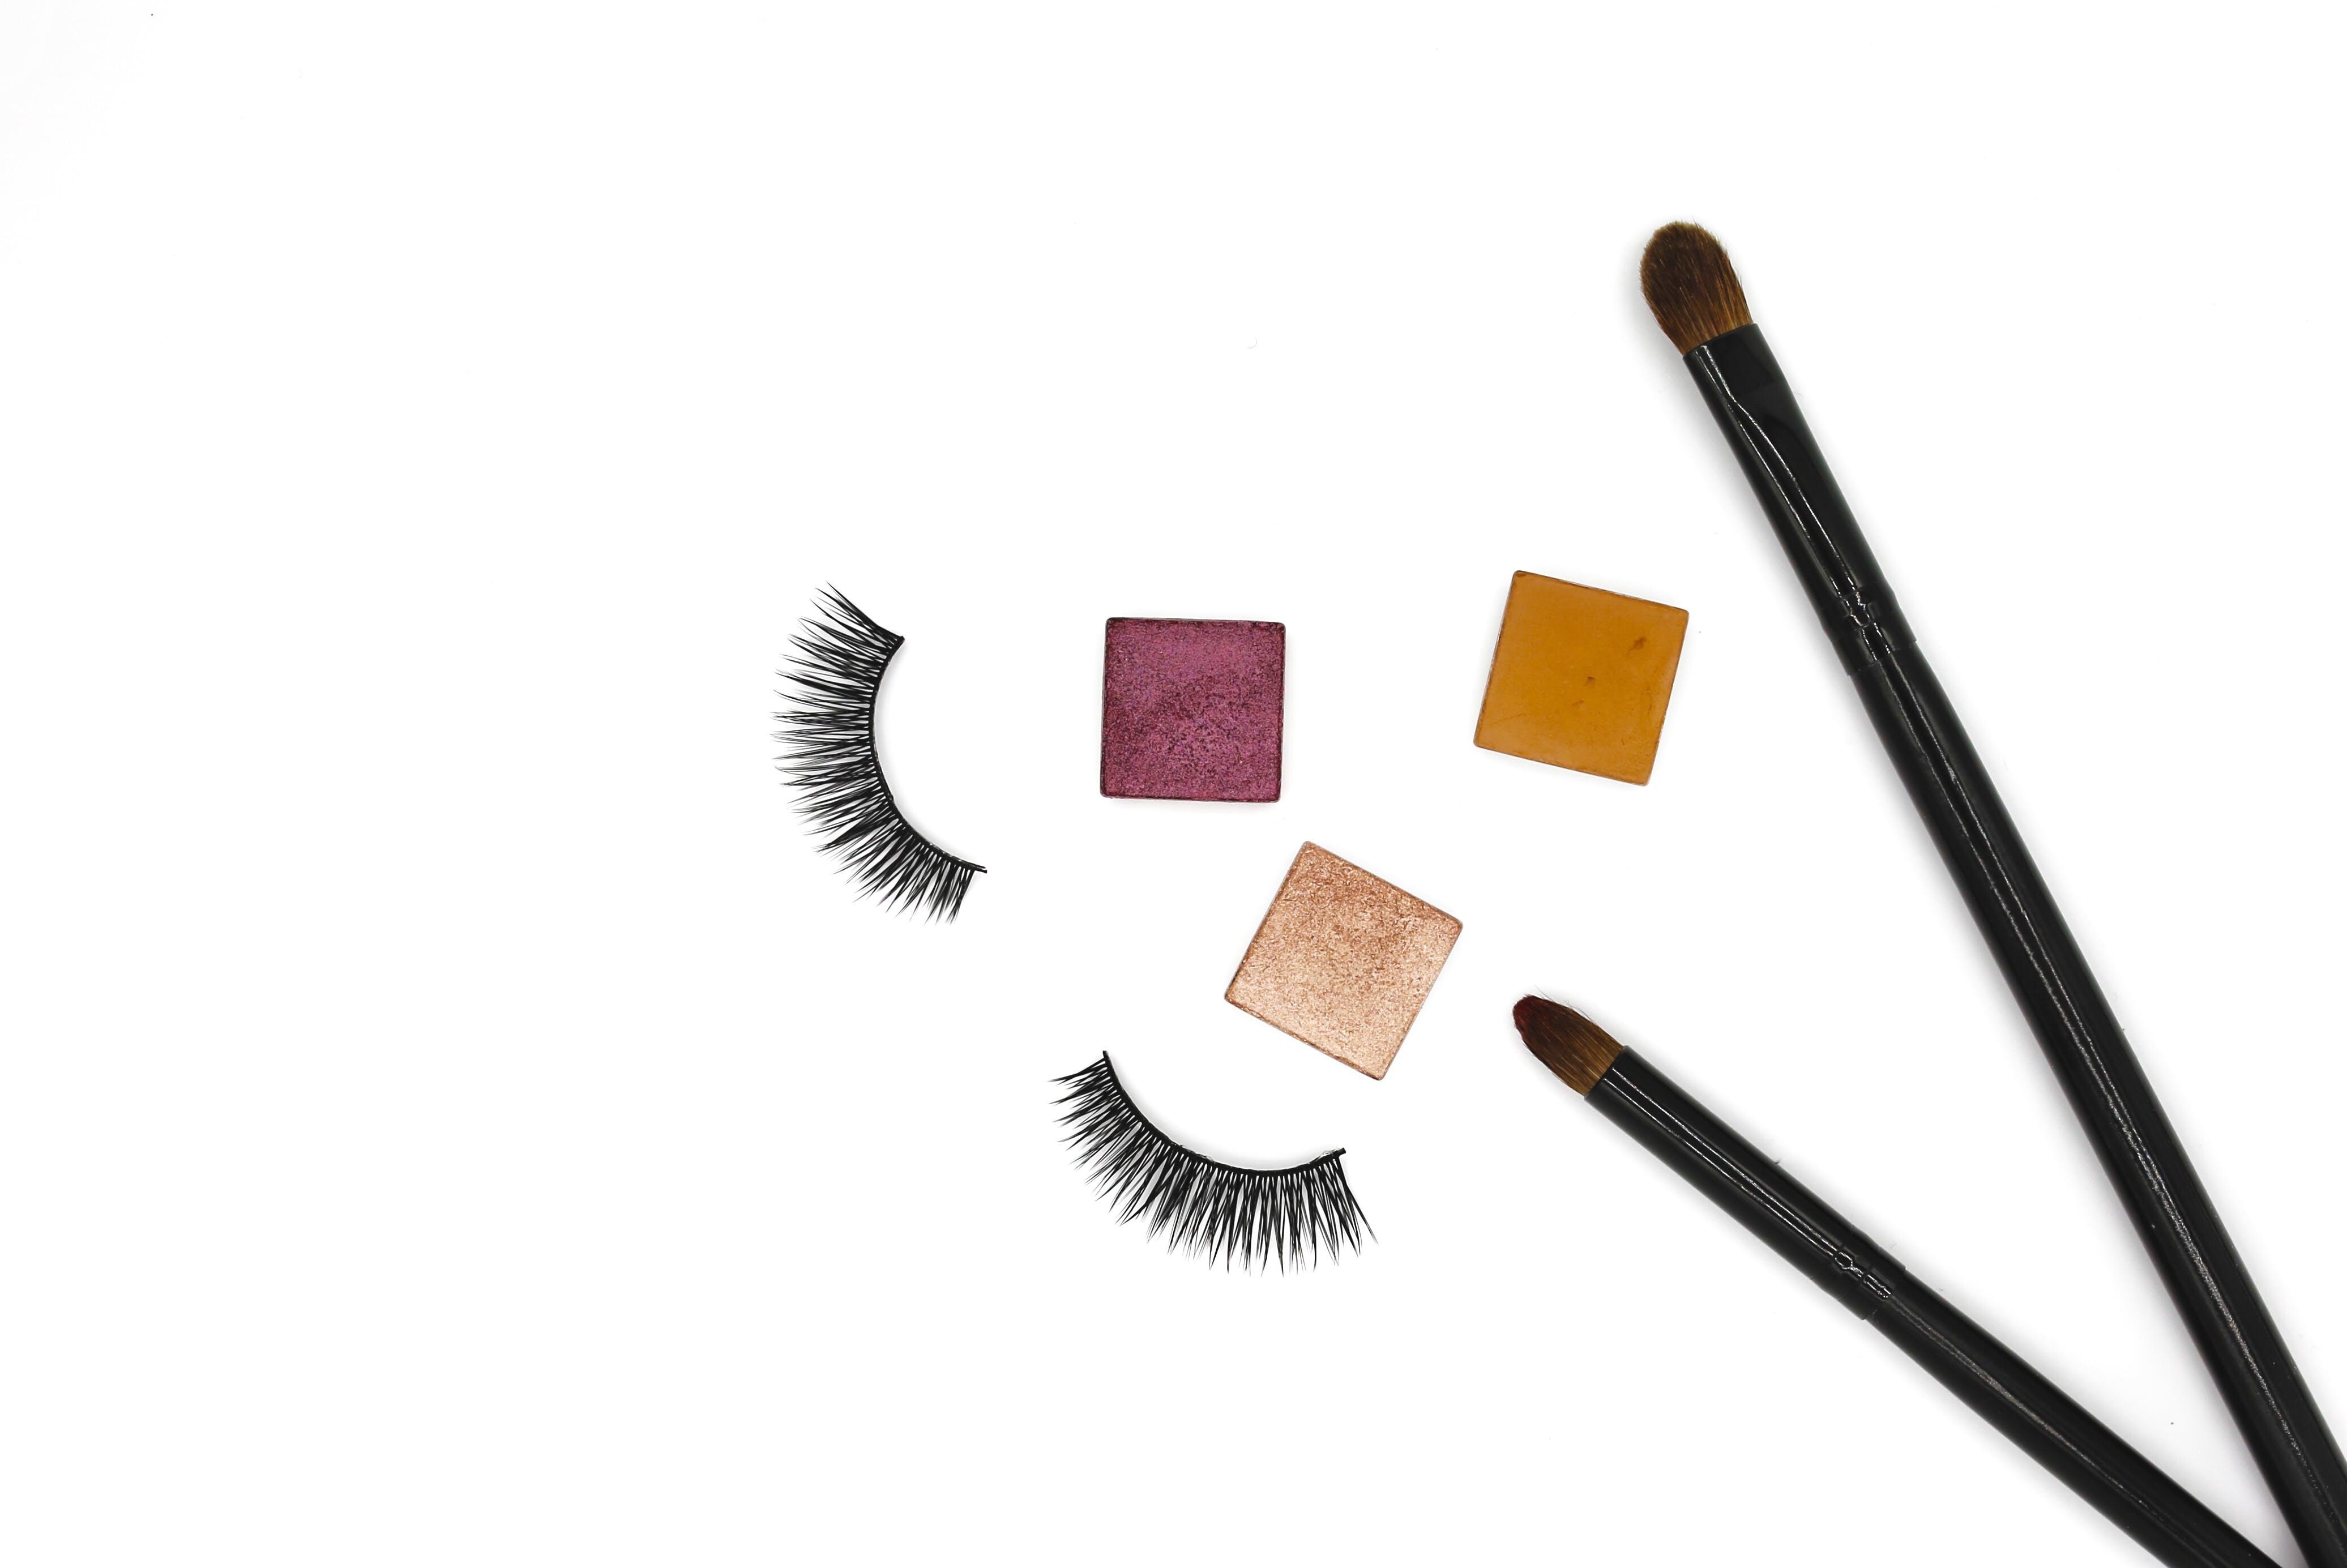 Free stock photo of #makeup #makeupbrushes